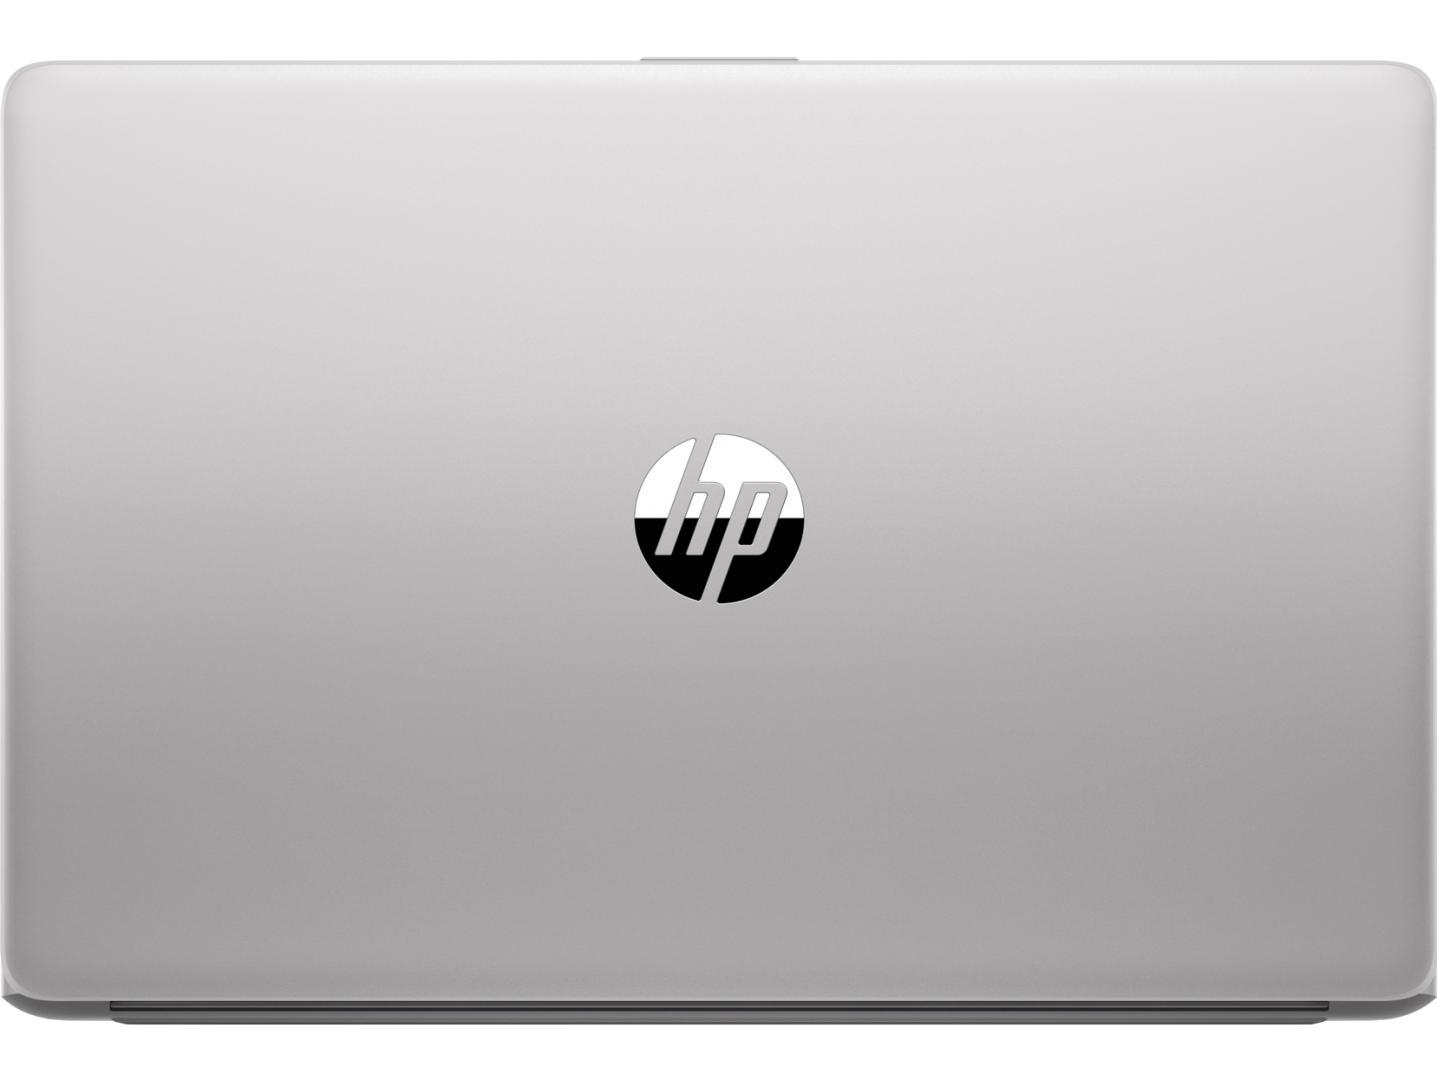 "NOTEBOOK HP 250G7 15.6"" FHD i3-1005G1 8GB 256GB 2GB-MX110 DOS - imaginea 4"